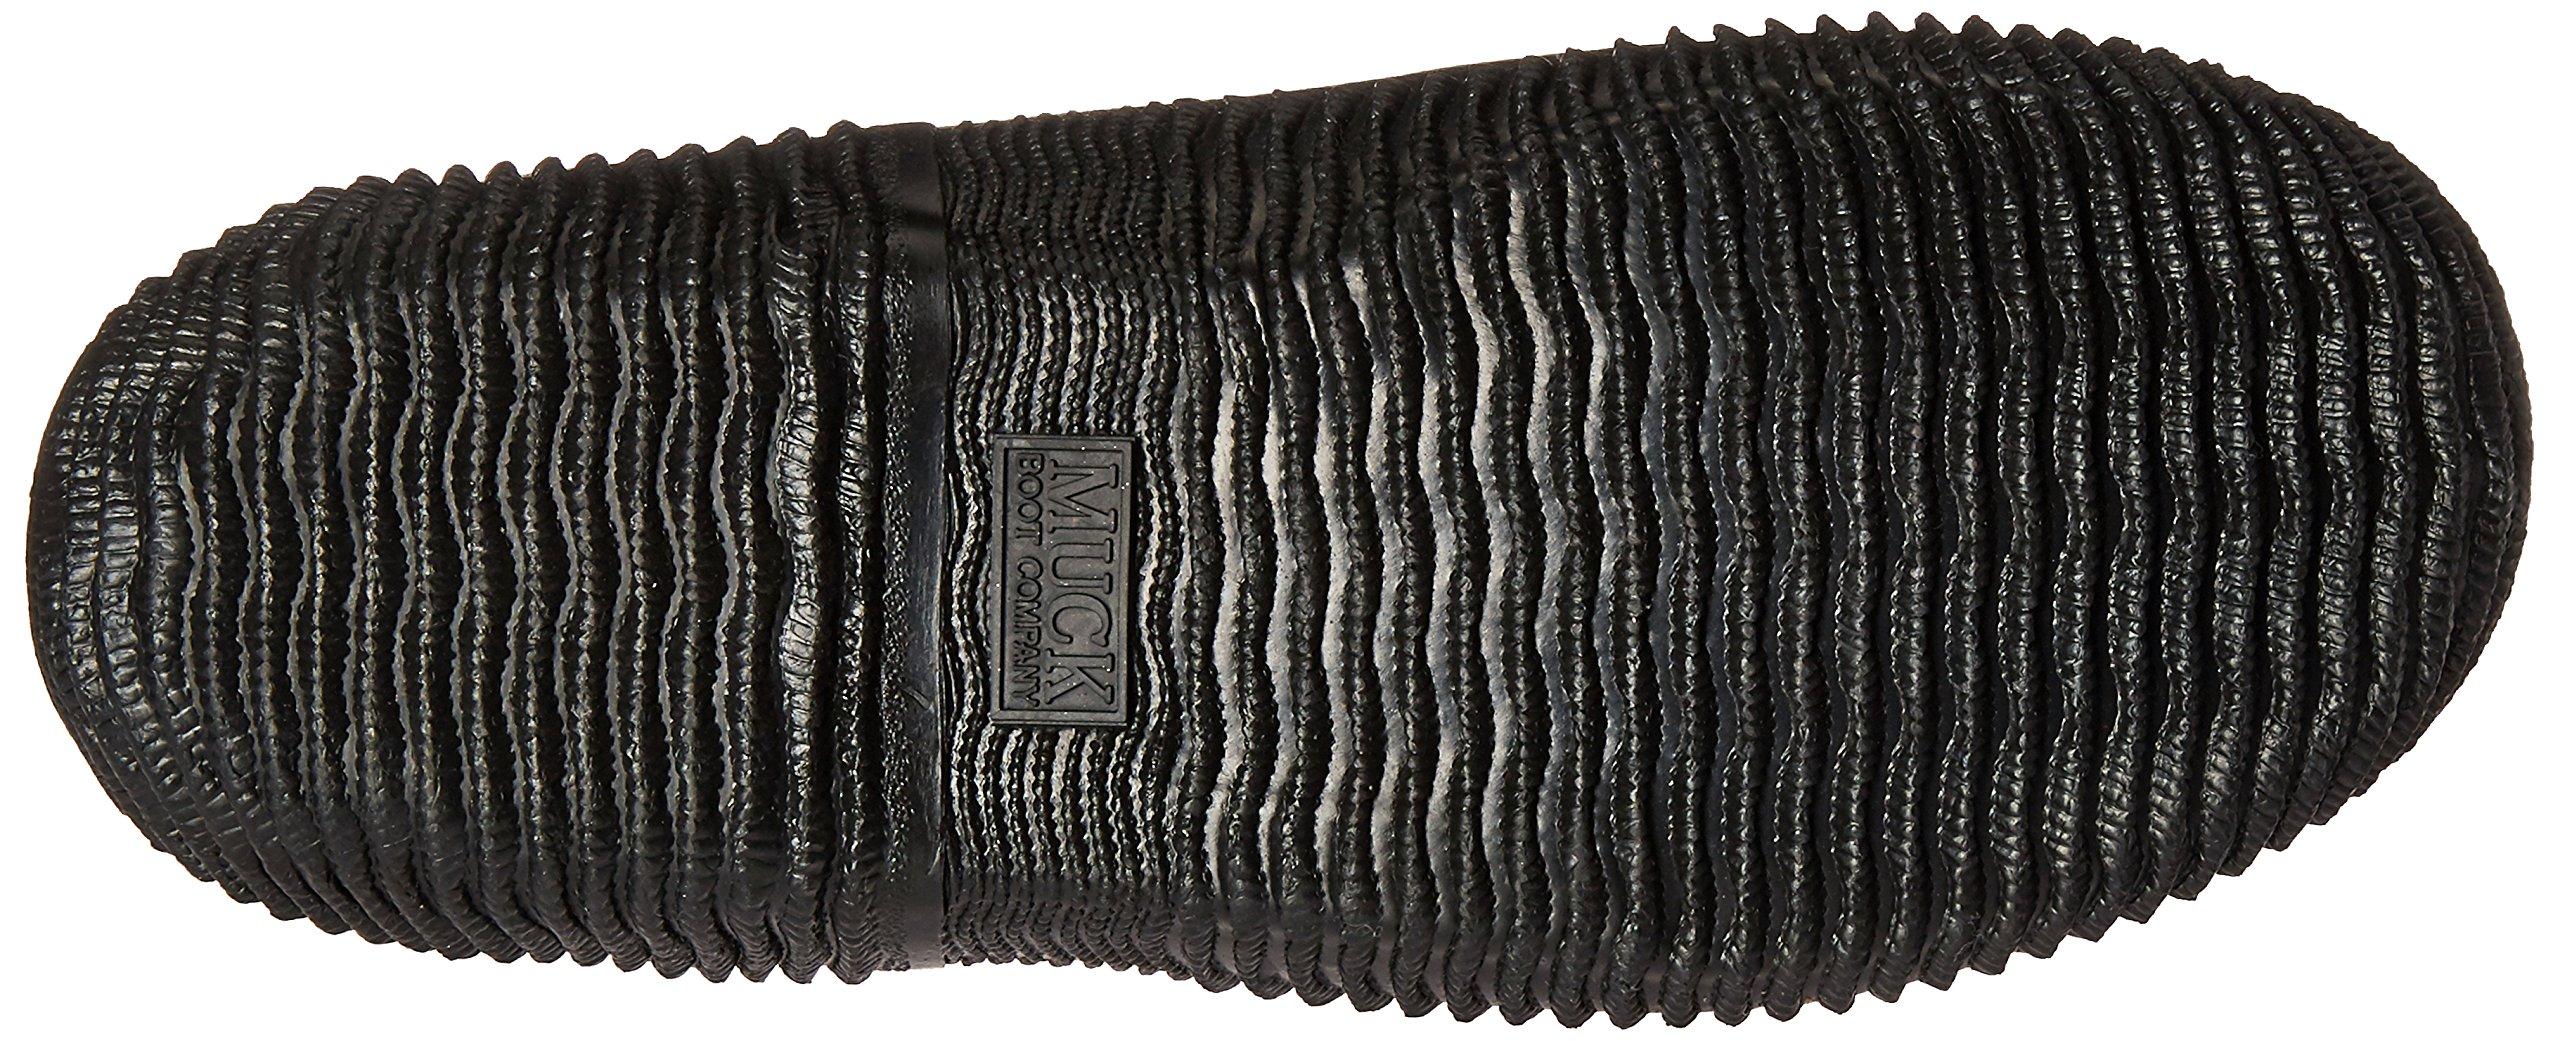 Muck Hale Multi-Season Women's Rubber Boots by Muck Boot (Image #3)